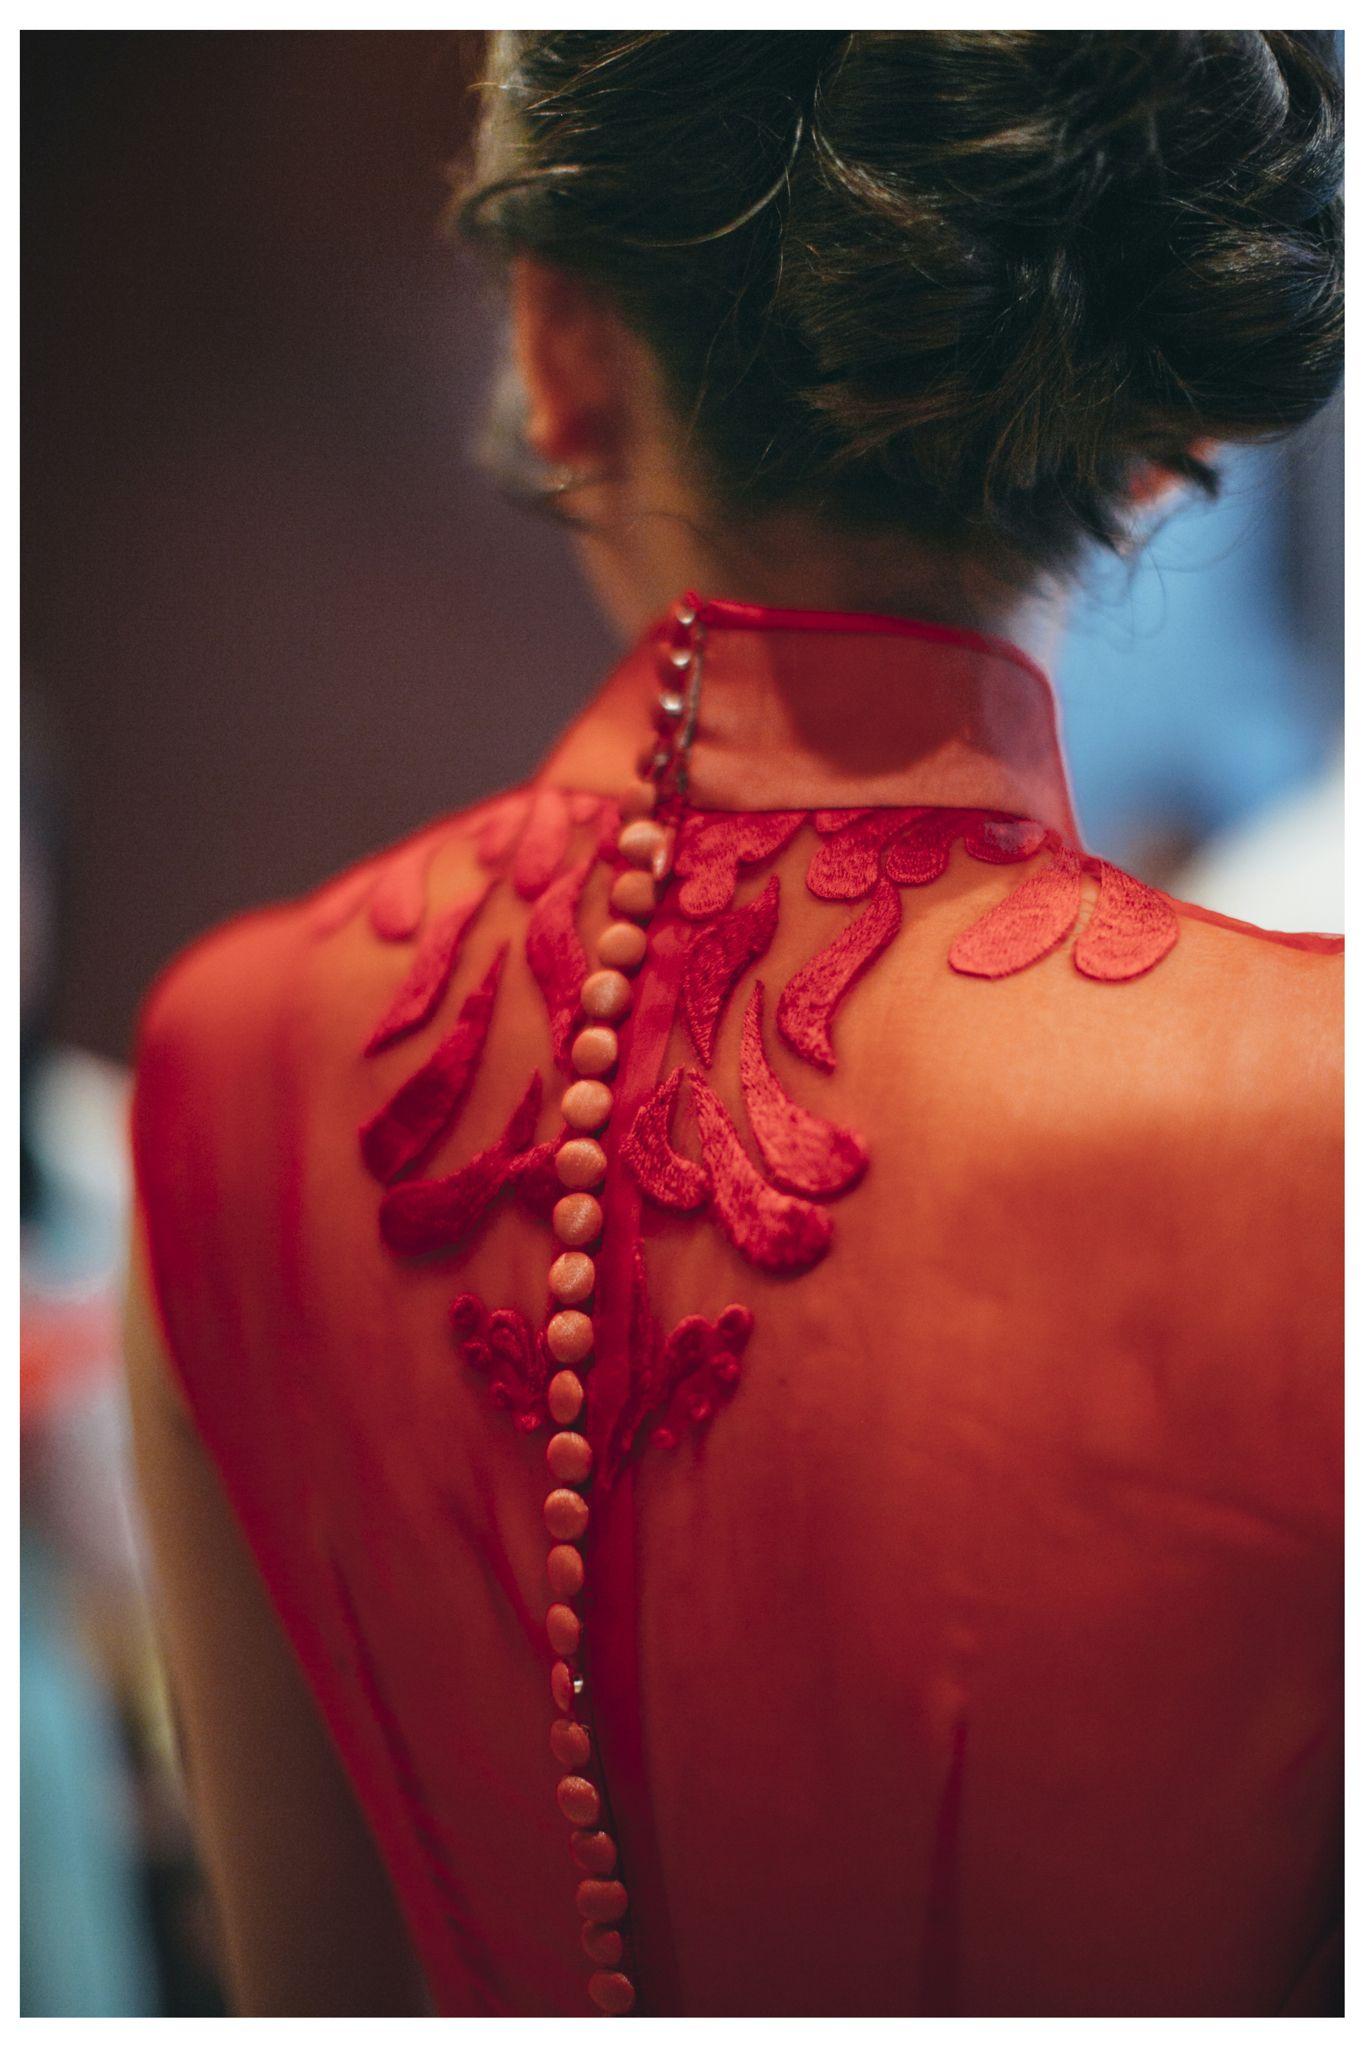 Celest Thoi bespoke Cheong Sam with custom embroidery